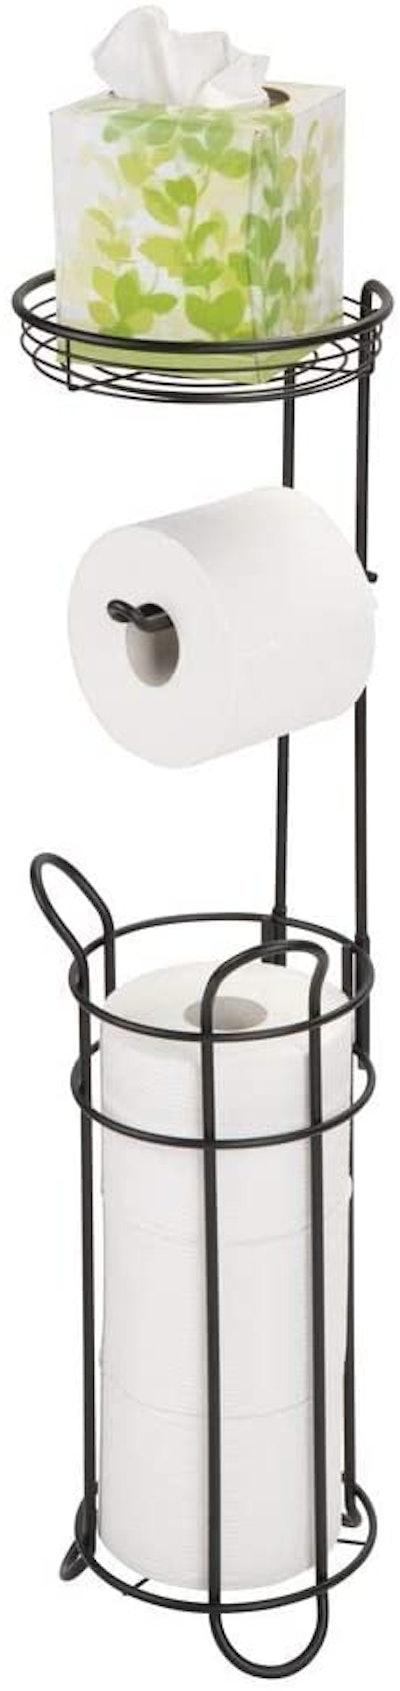 mDesign Free Standing Toilet Paper Holder